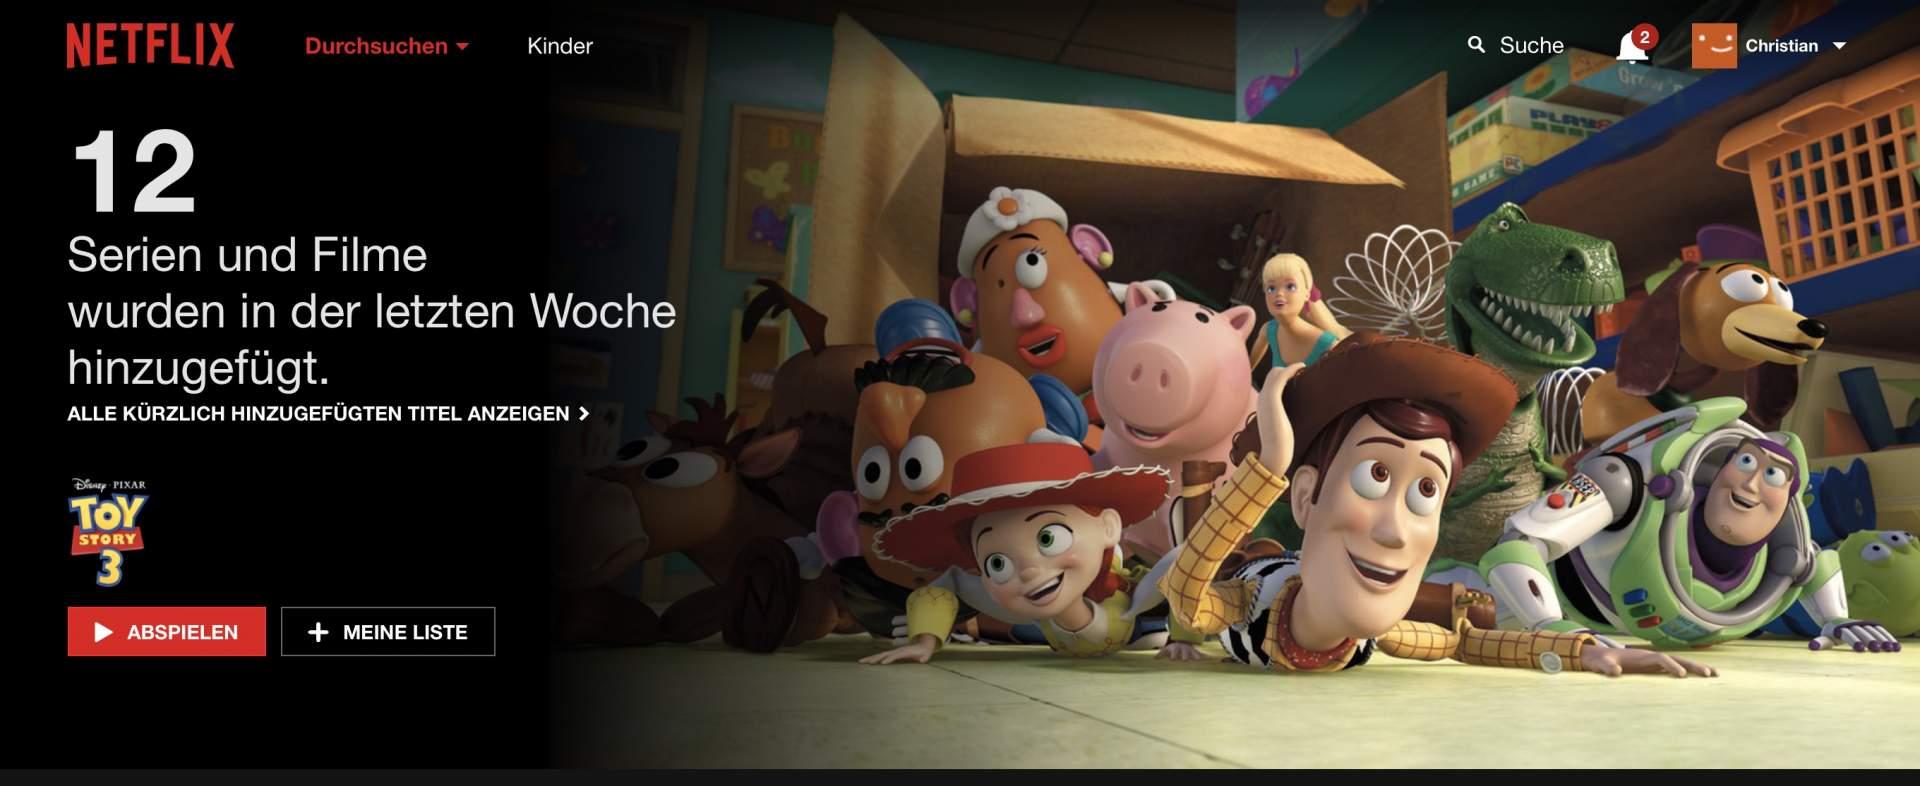 Netflix spinnt unter Safari 11